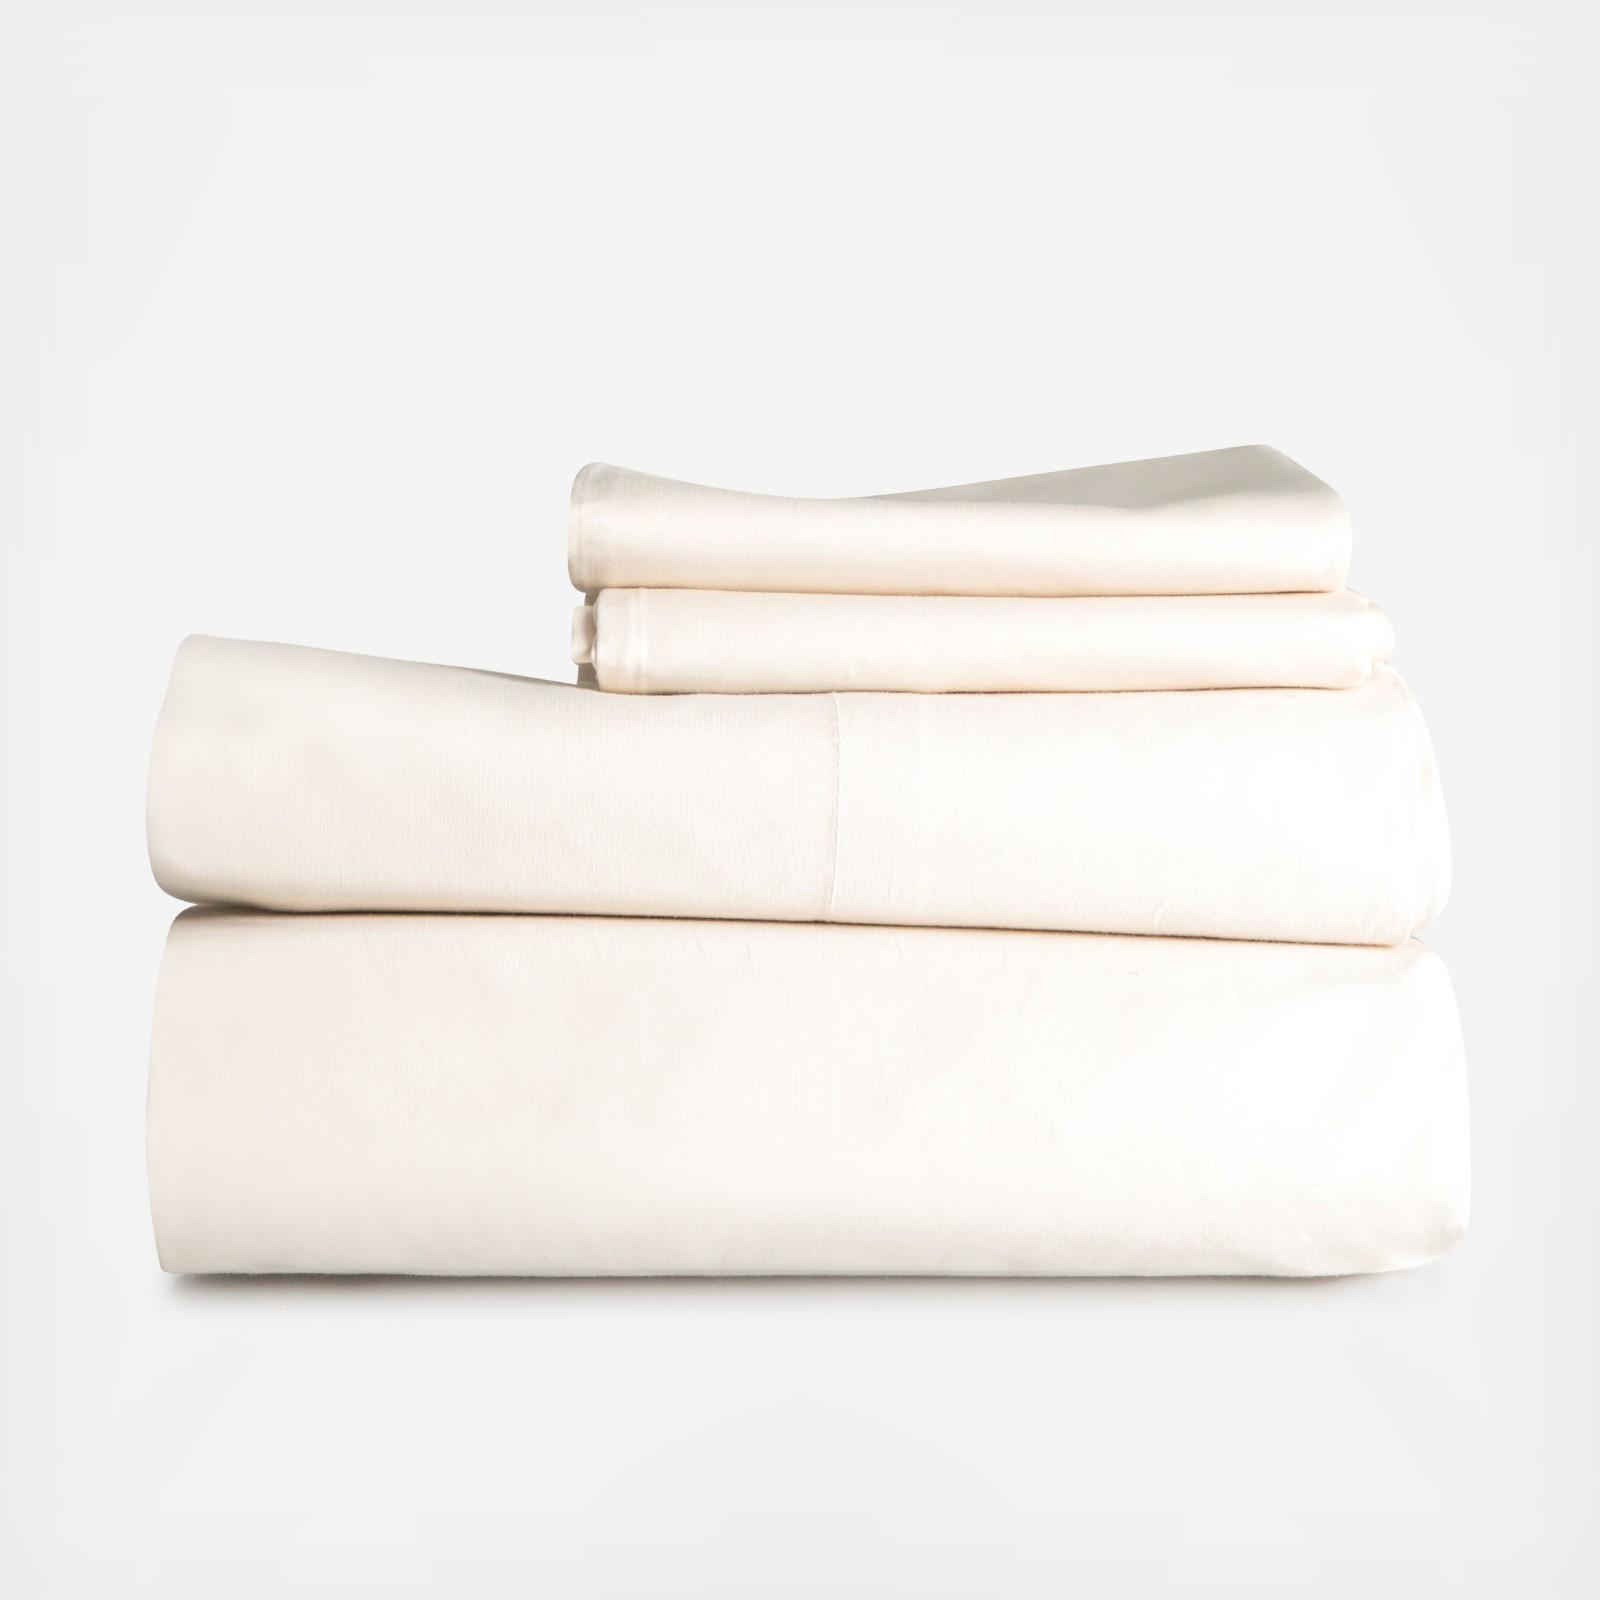 Amaze by welspun cotton sheet set bedding king navy blue - Amaze By Welspun Cotton Sheet Set Bedding King Navy Blue 13